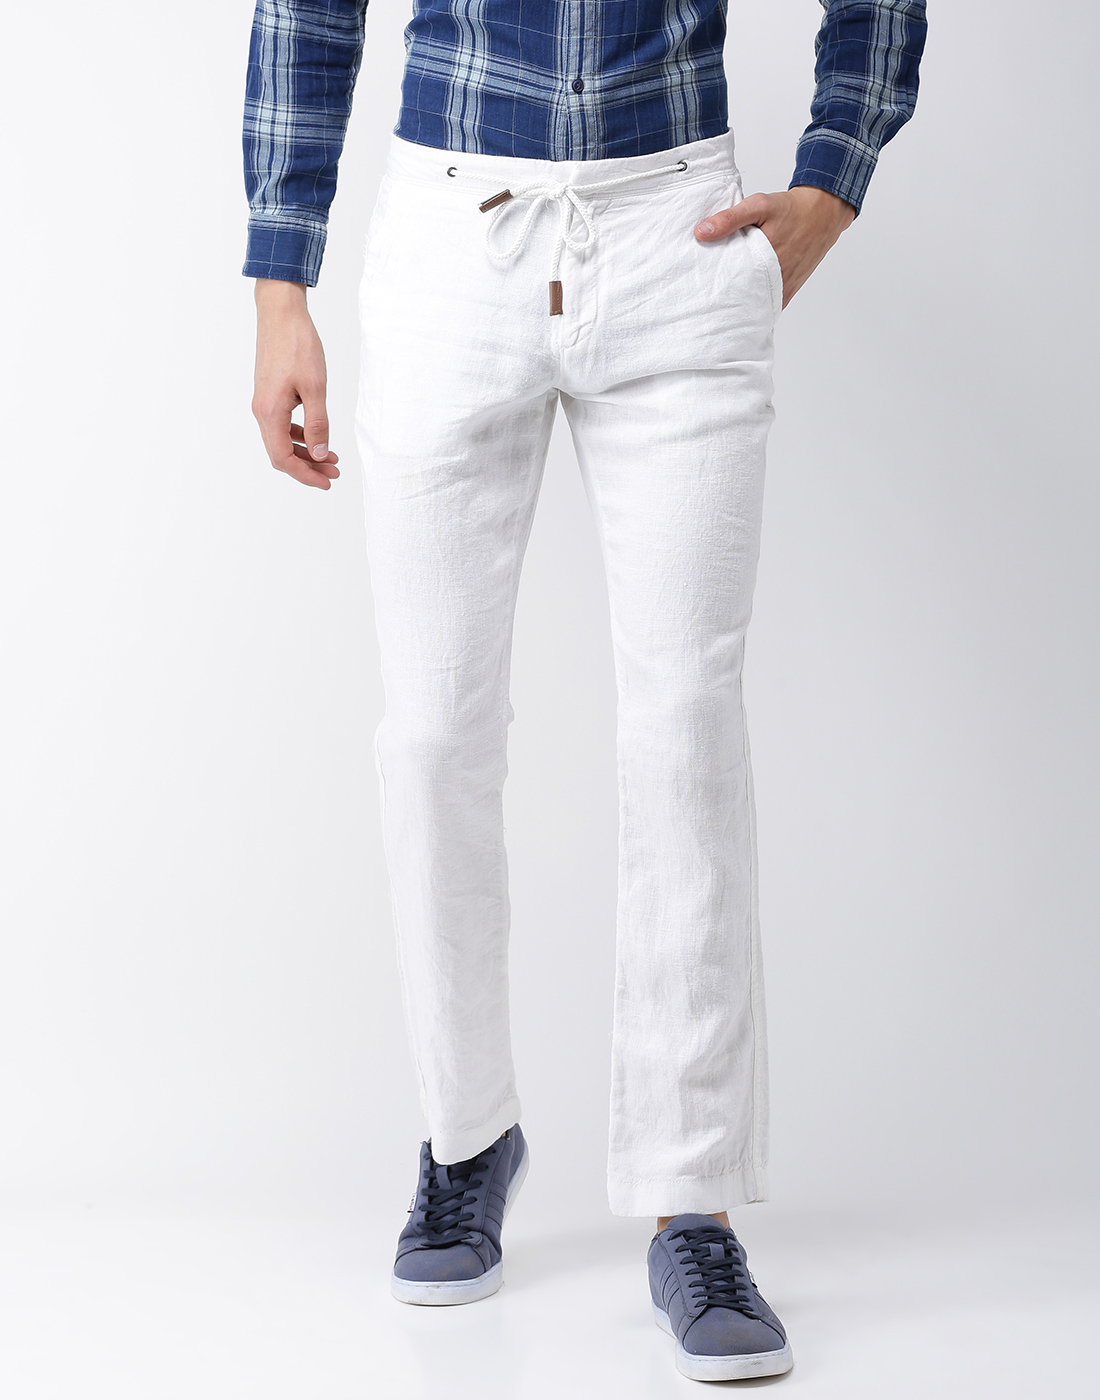 celio   100% Linen Straight Fit White Trouser